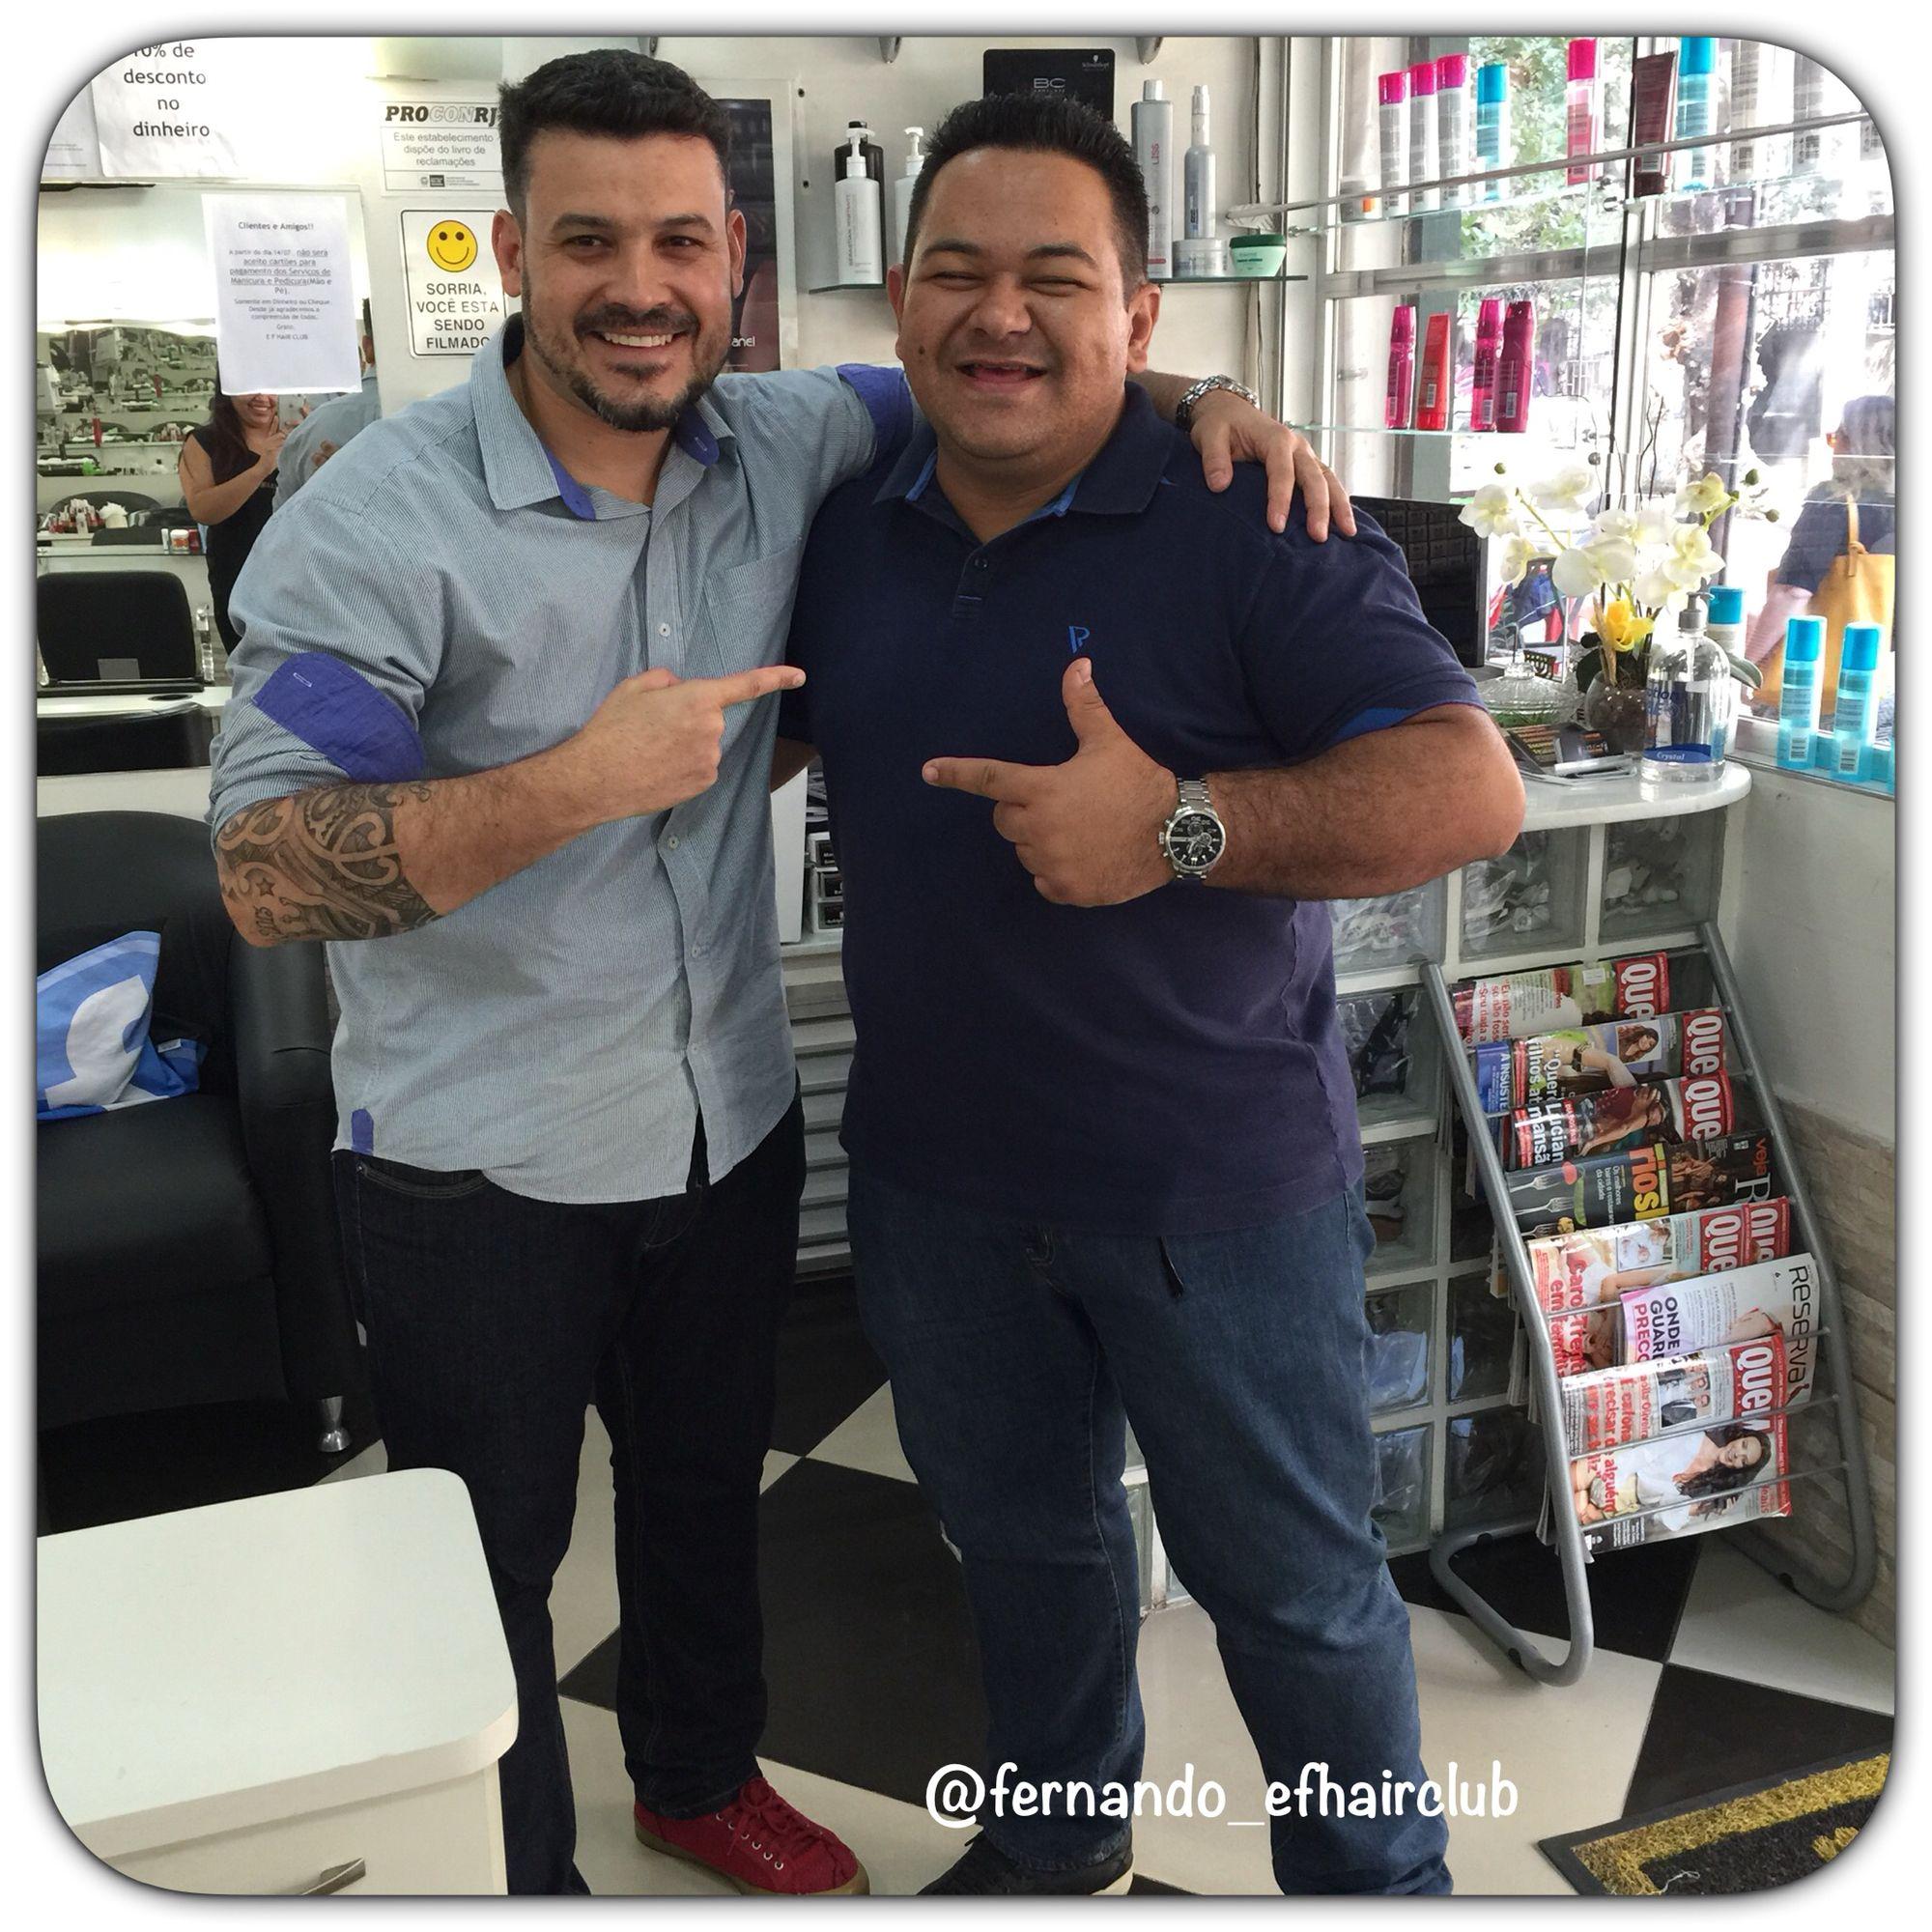 Obrigado, Vinícius Mattos pela moral de sempre!!! #ObrigadoSenhor #DeusNaFrente #EFHairClubBARbearia #EFHairClub #barbershopbrasil #tijuca  #cortando #TapaNoVisual #cabelo #cortemasculino #pompadour #barberlove #barbershopconnect #barbersince98